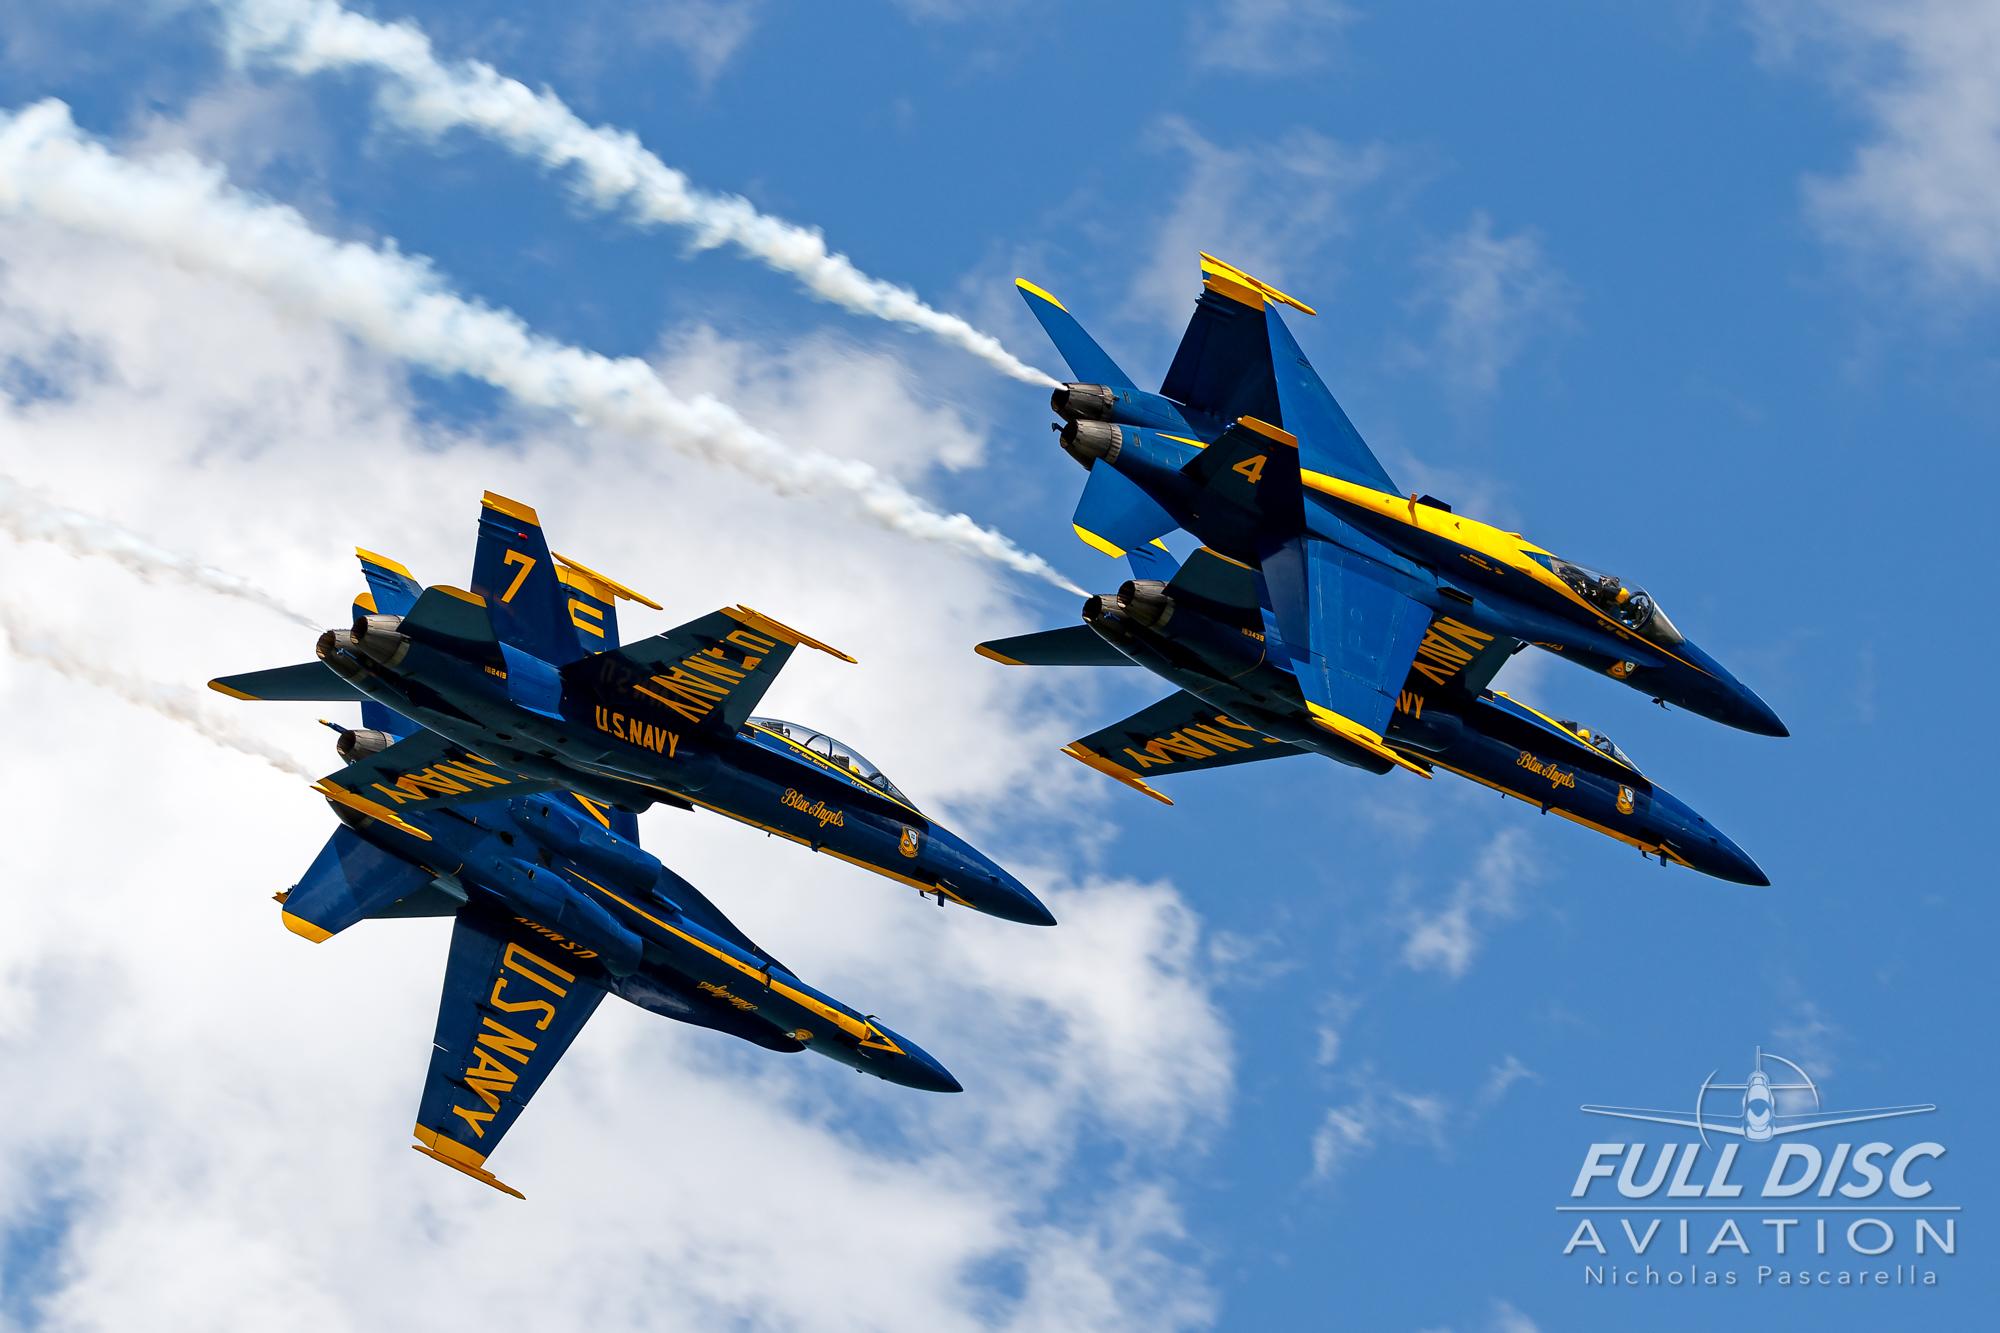 nickpascarella_fulldiscaviation_oceancityairshow_aviation_blueangels_break.jpg